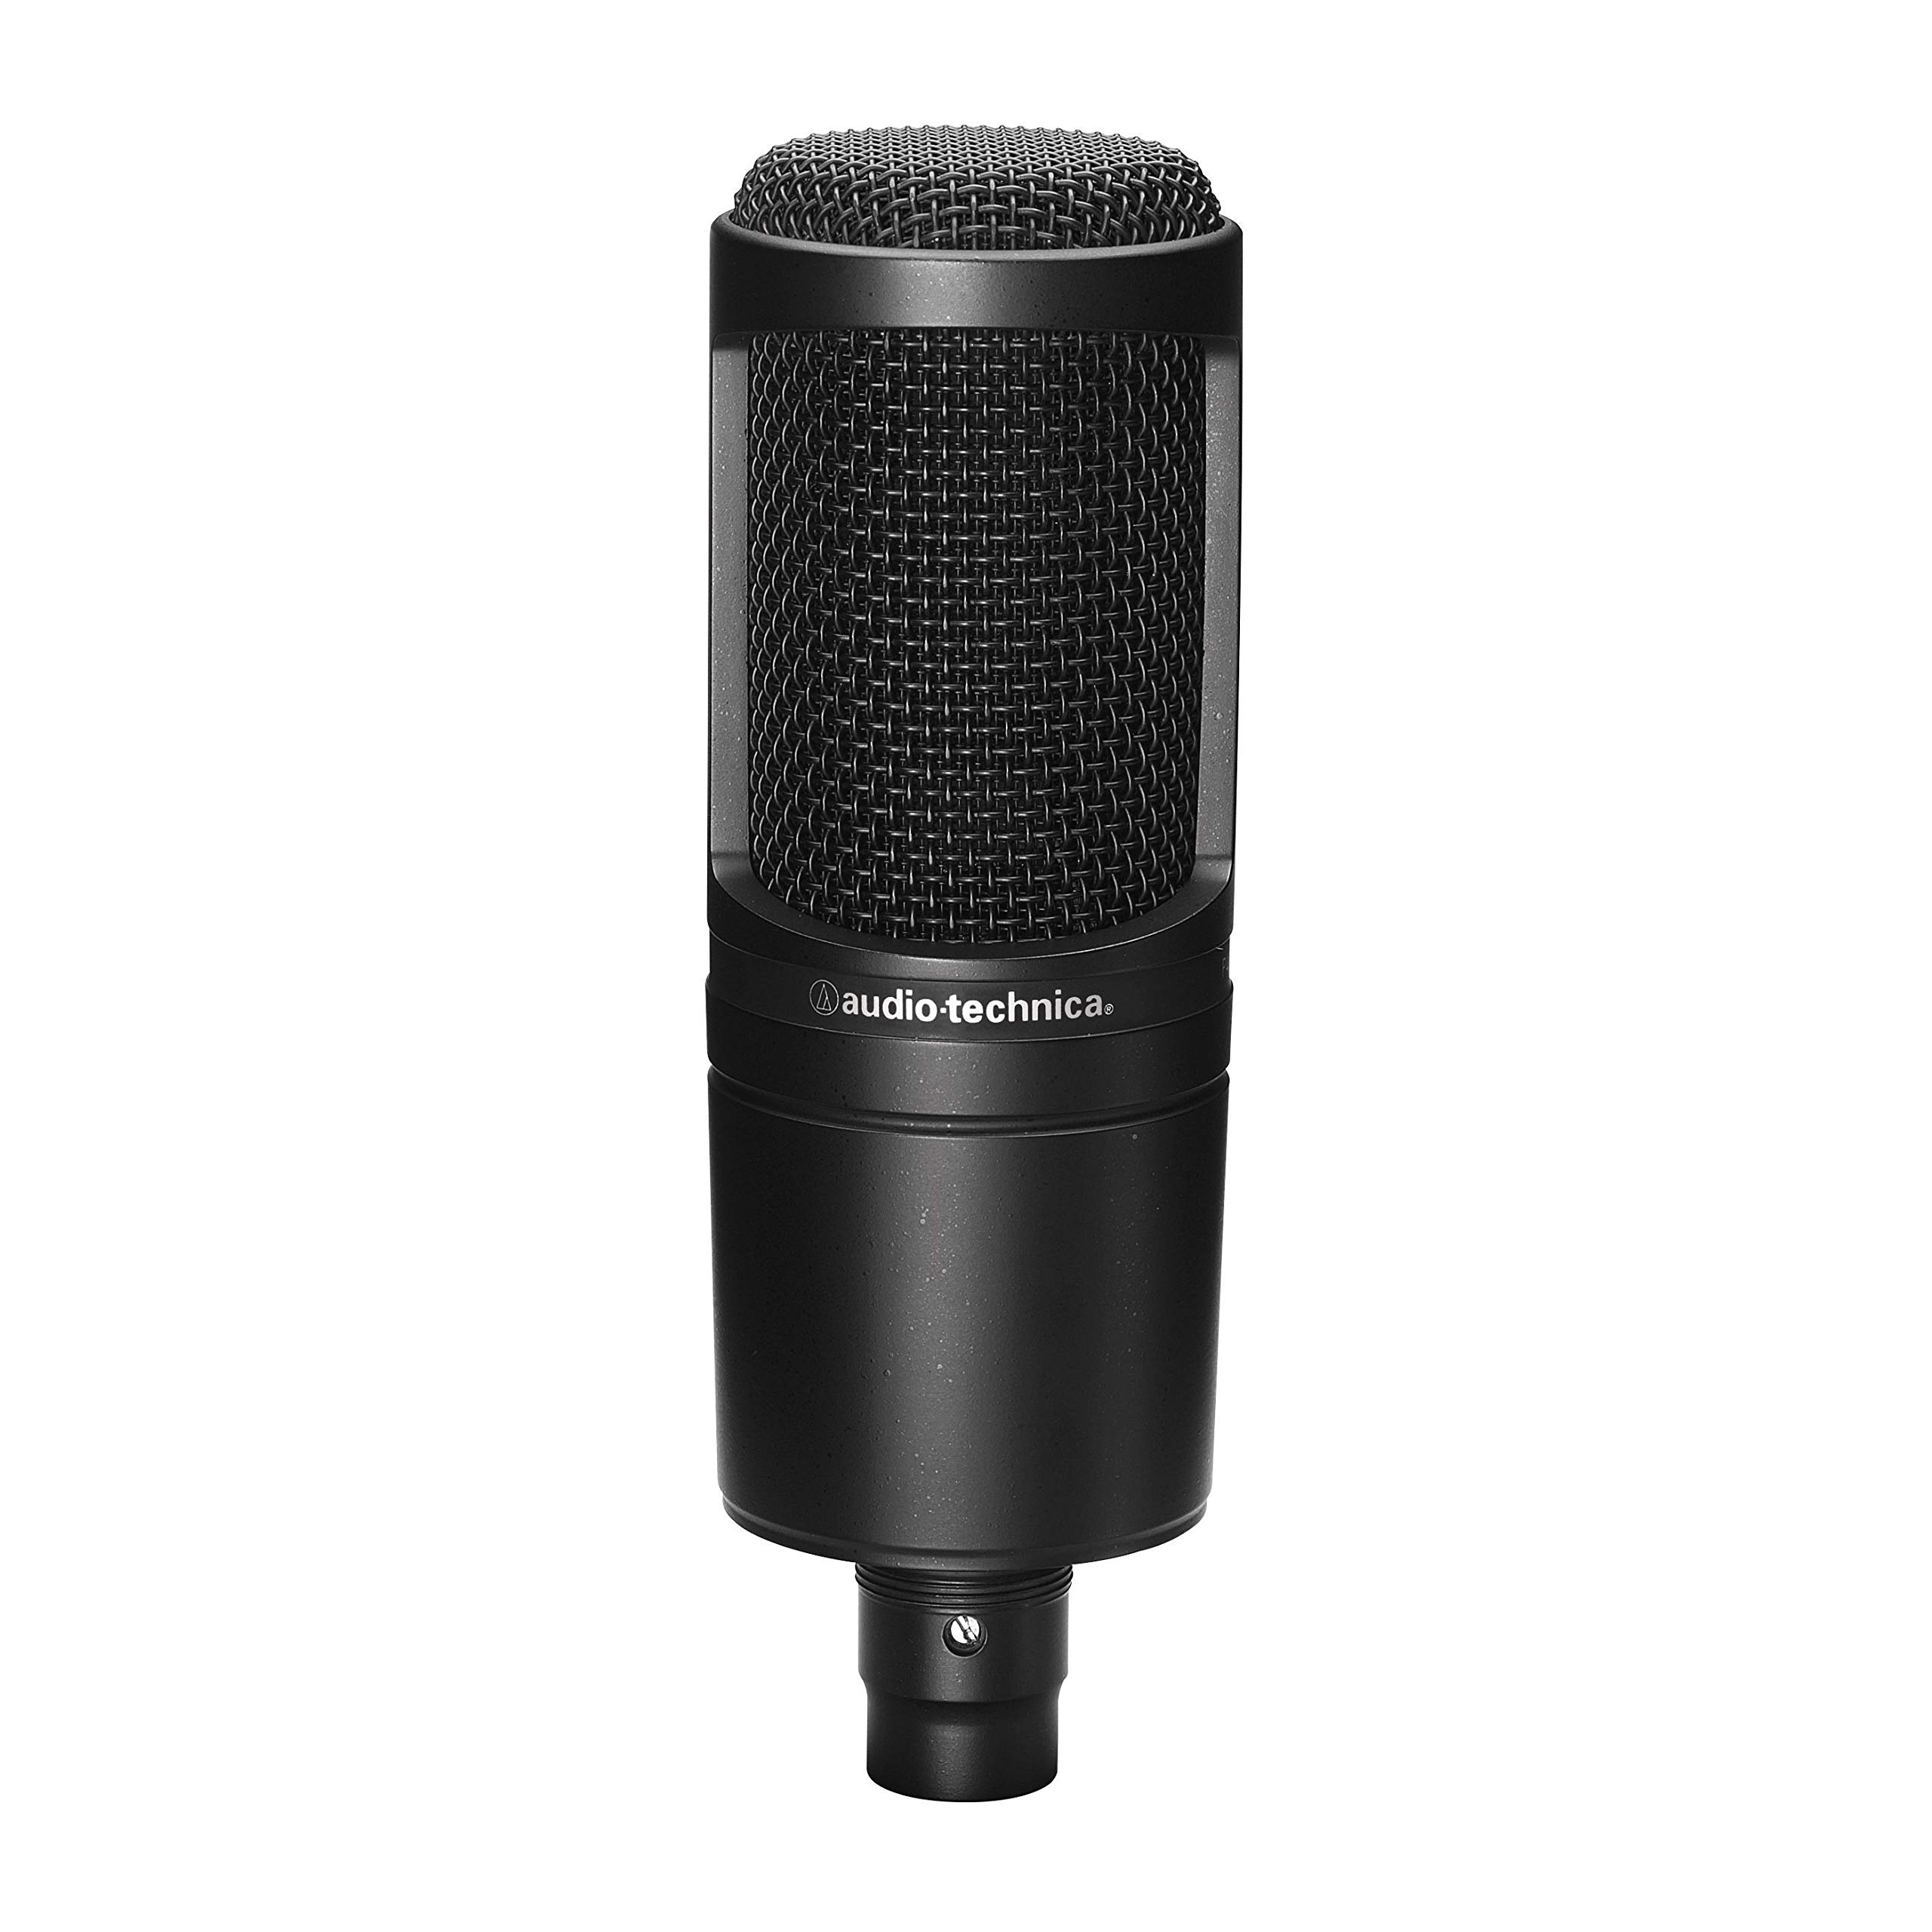 Audio-Technica AT2020 Cardioid Condenser Studio XLR Microphone, Black by Audio-Technica (Image #3)